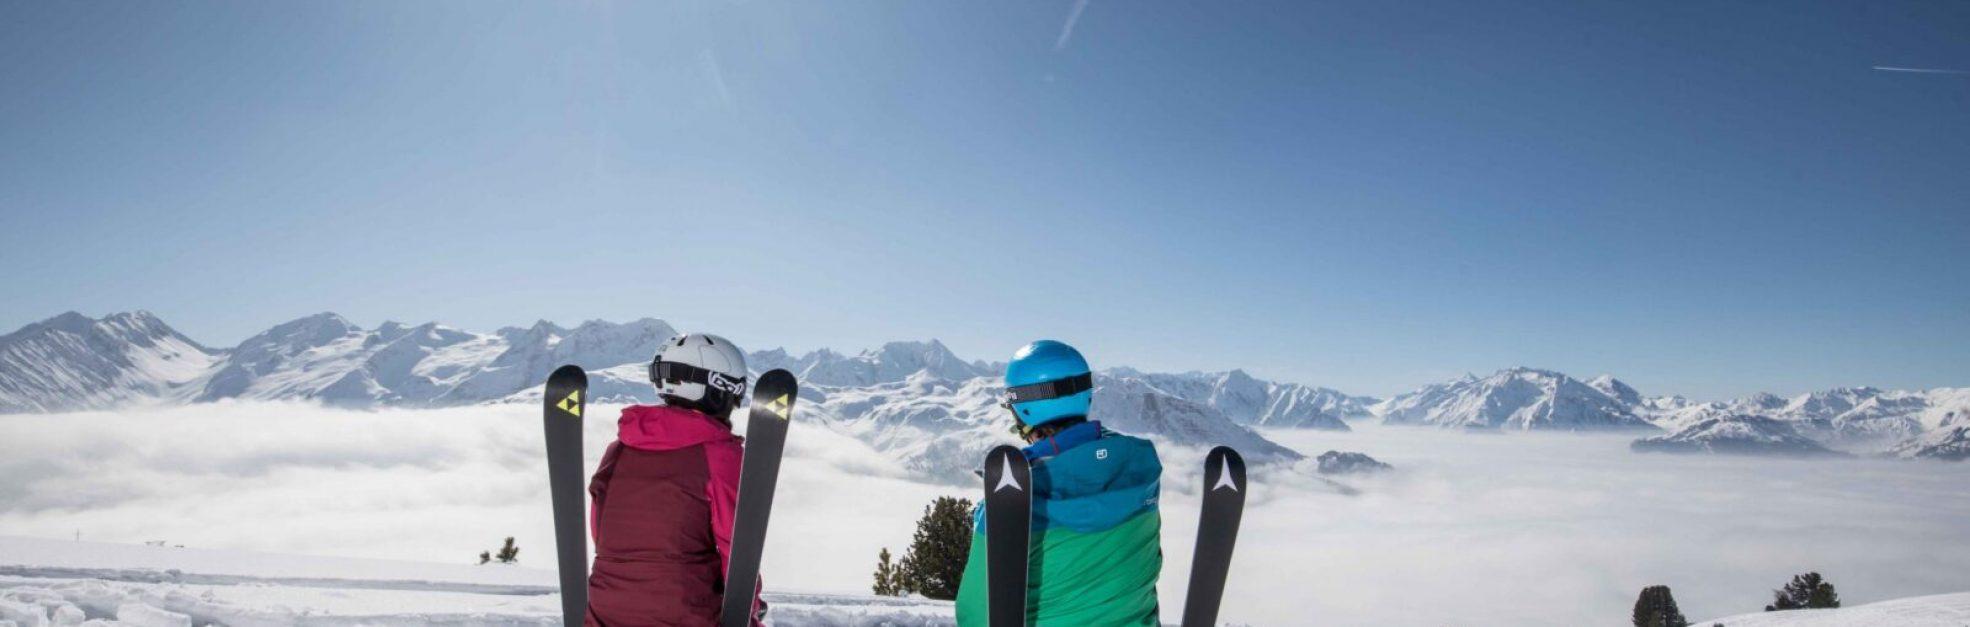 Skifahren in Krimml